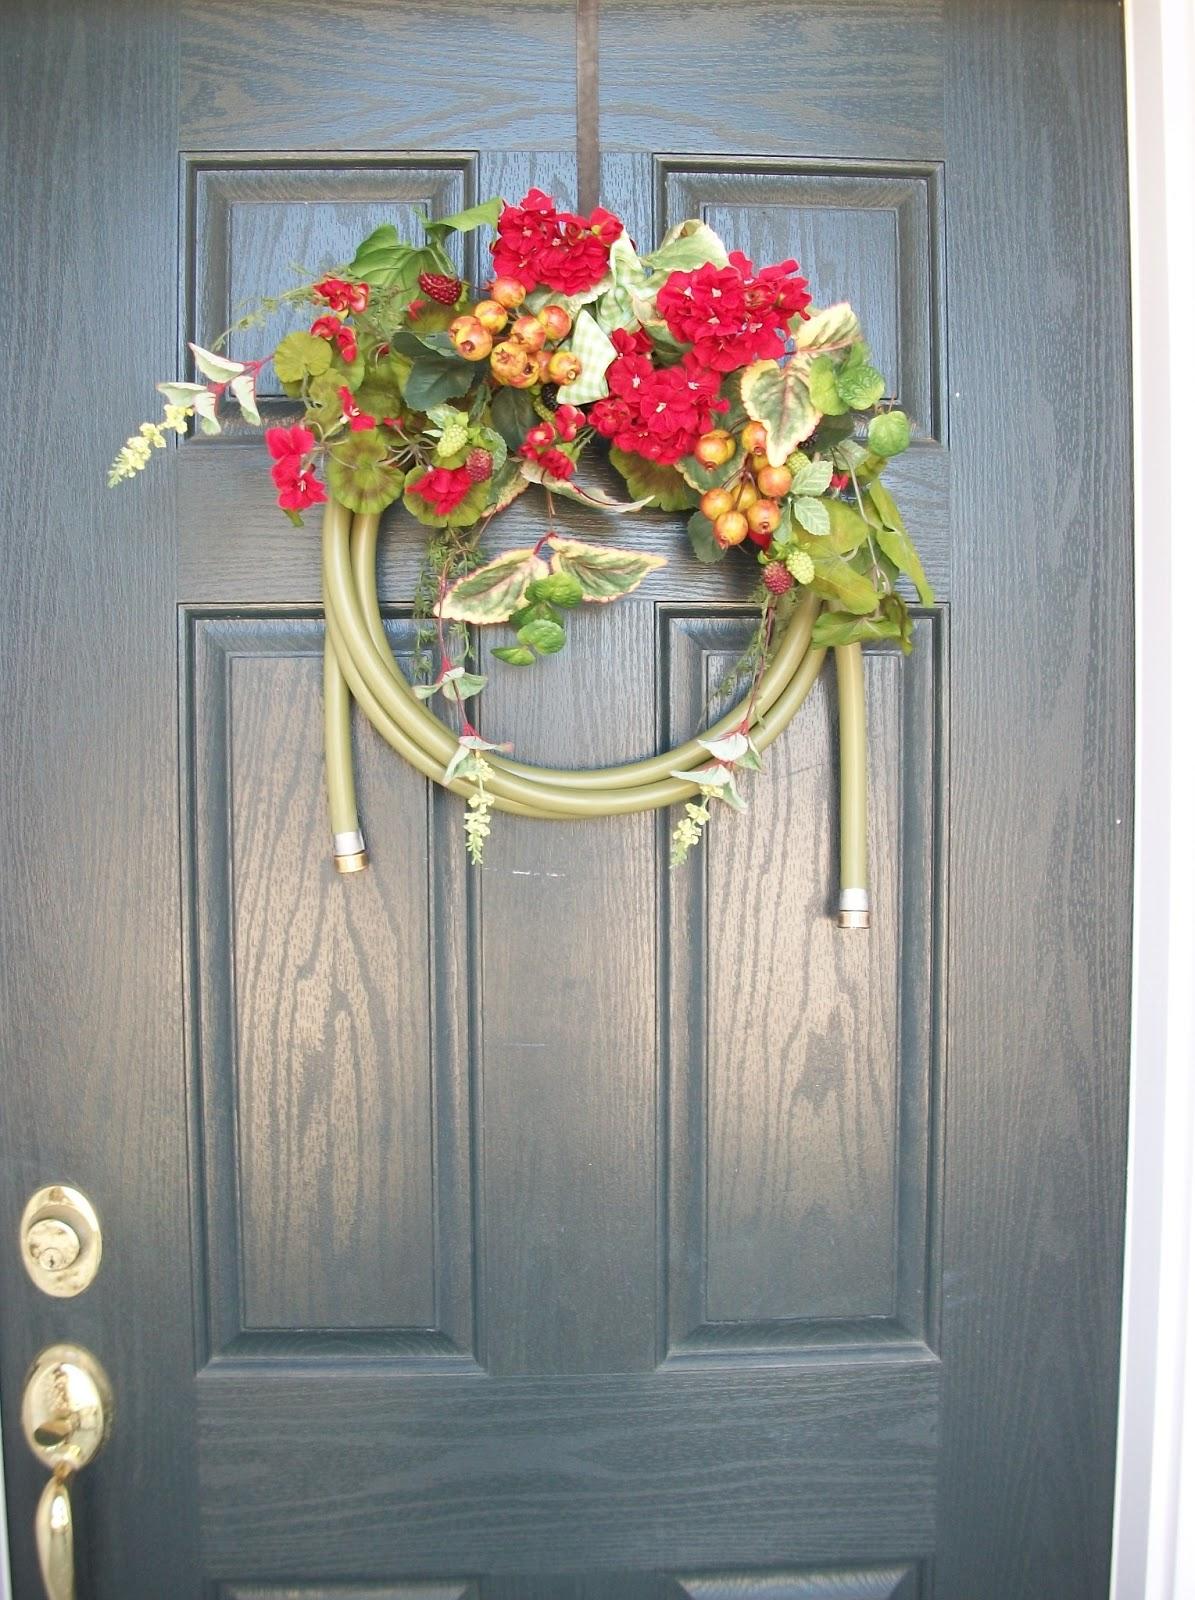 Water Hose Wreath Garden Hose Wreath From